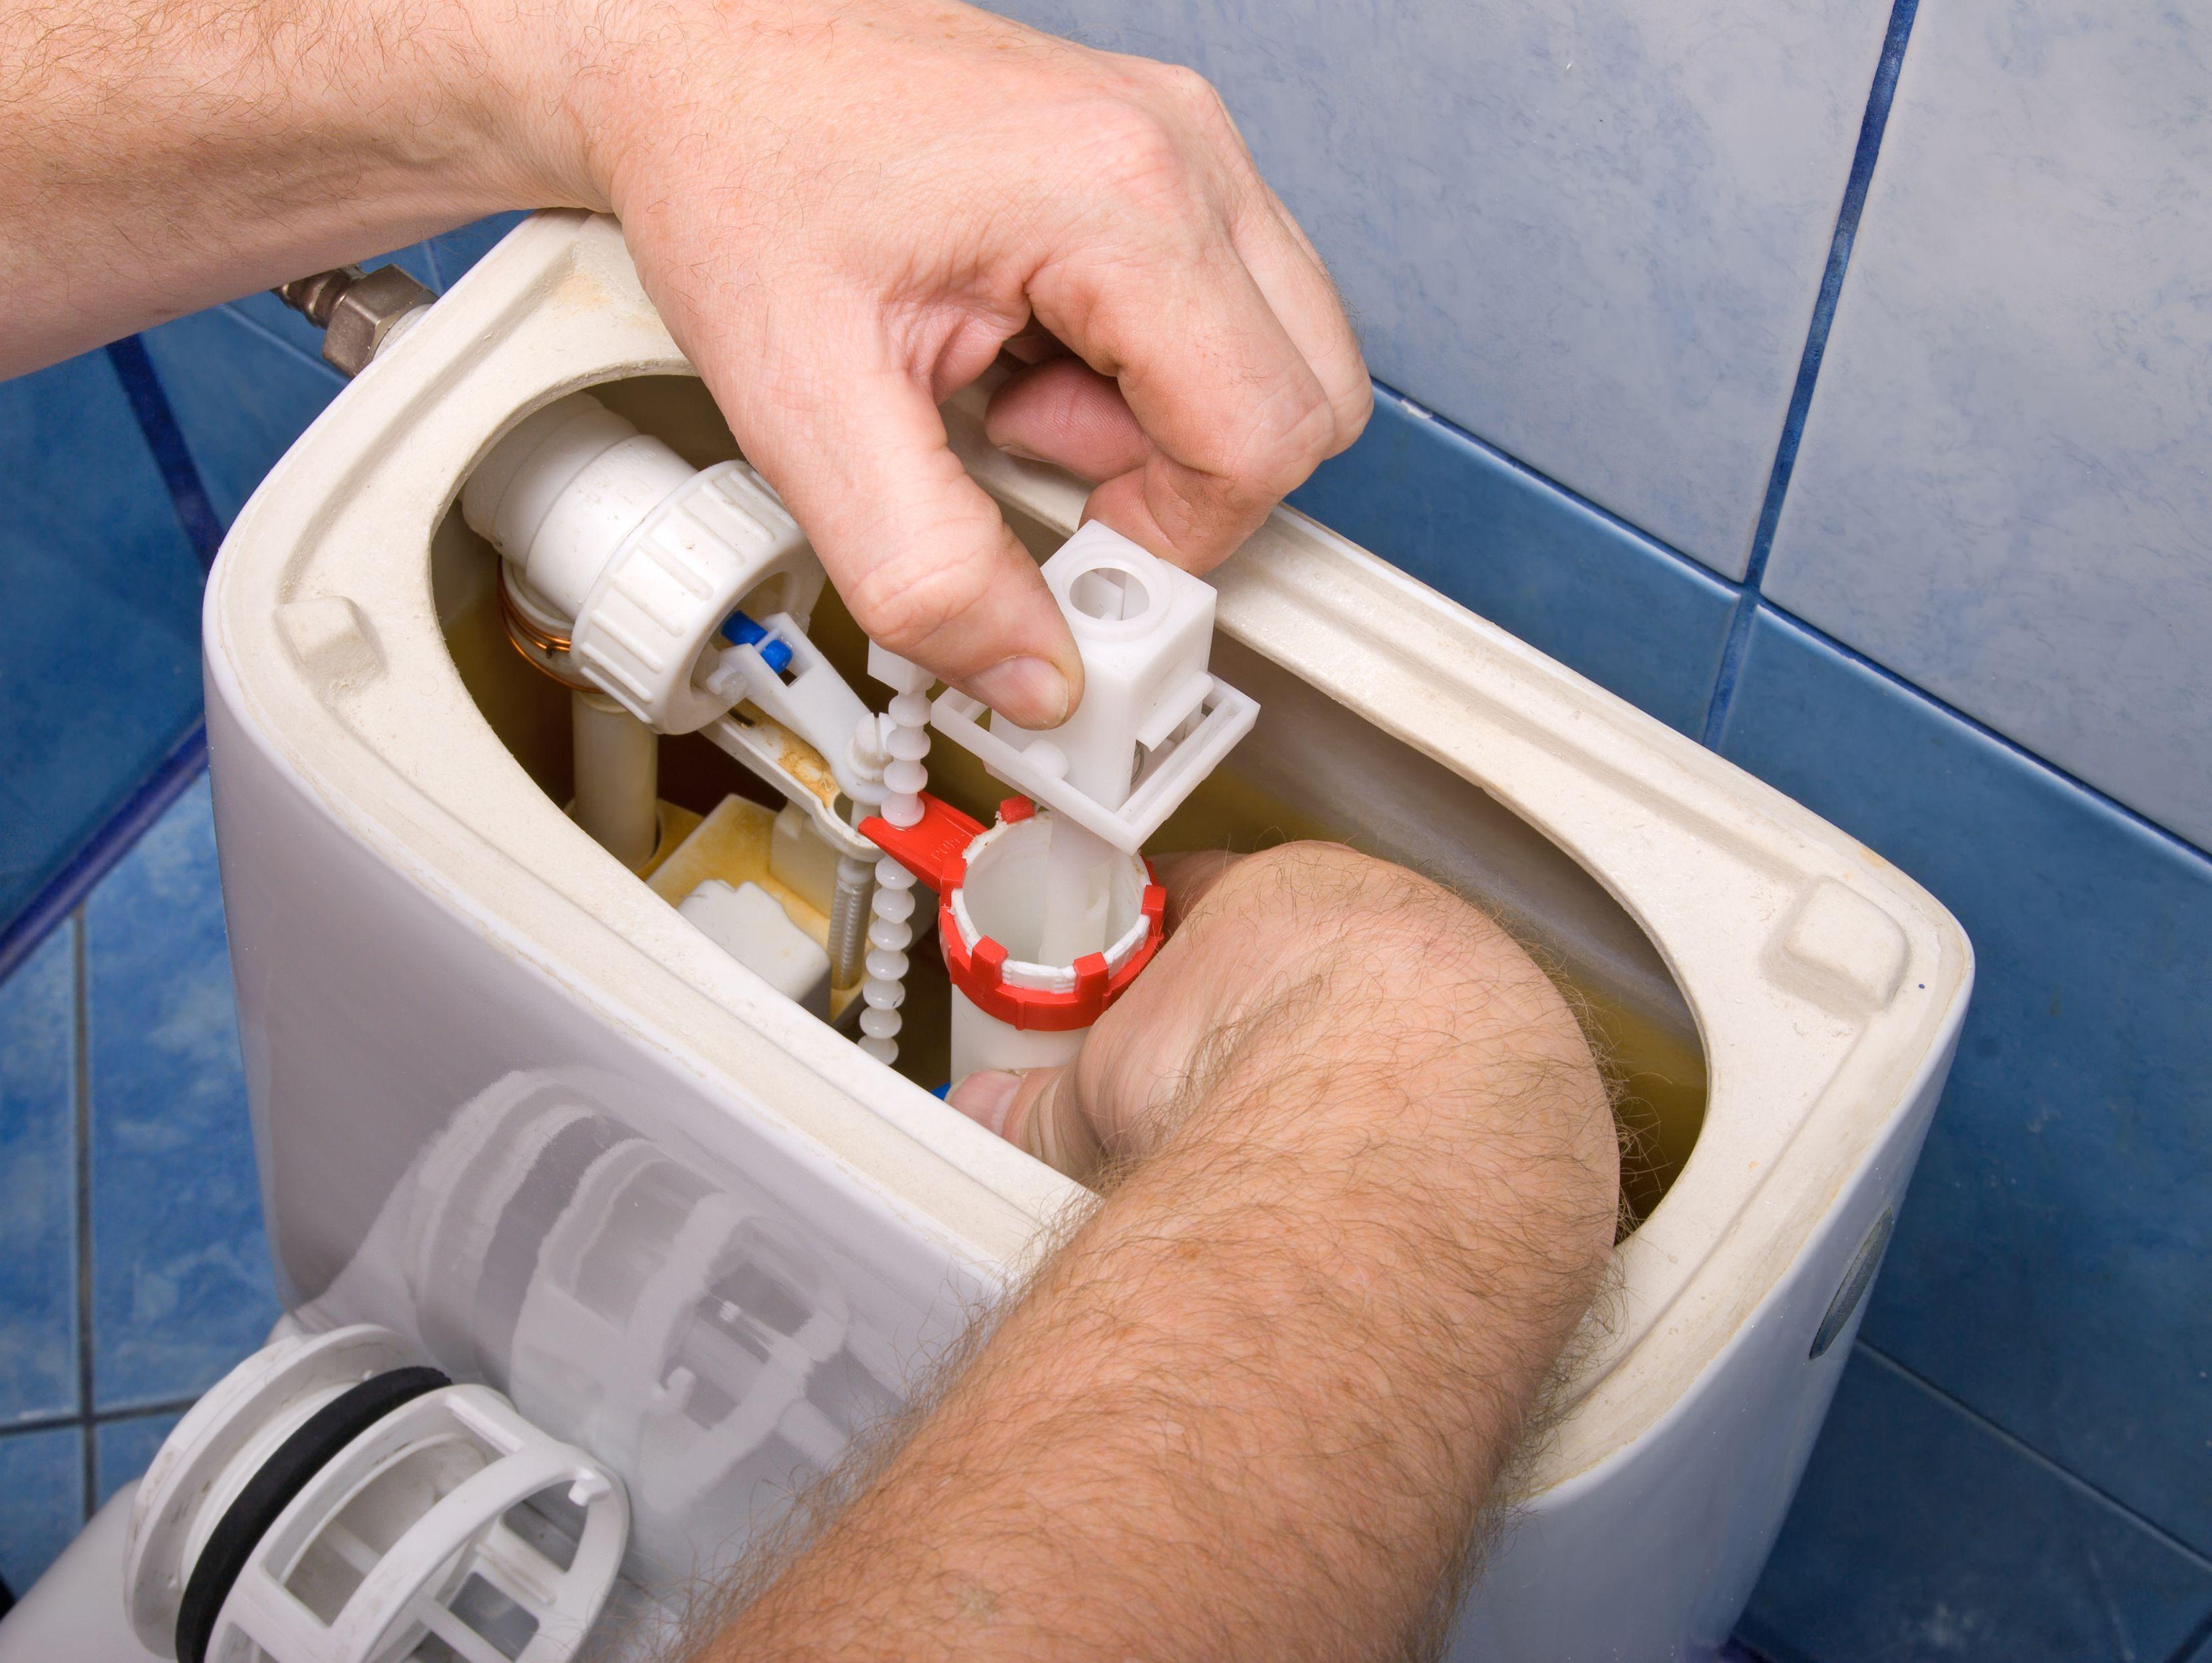 Repairing a Leaky Toilet Flush Drain Valve